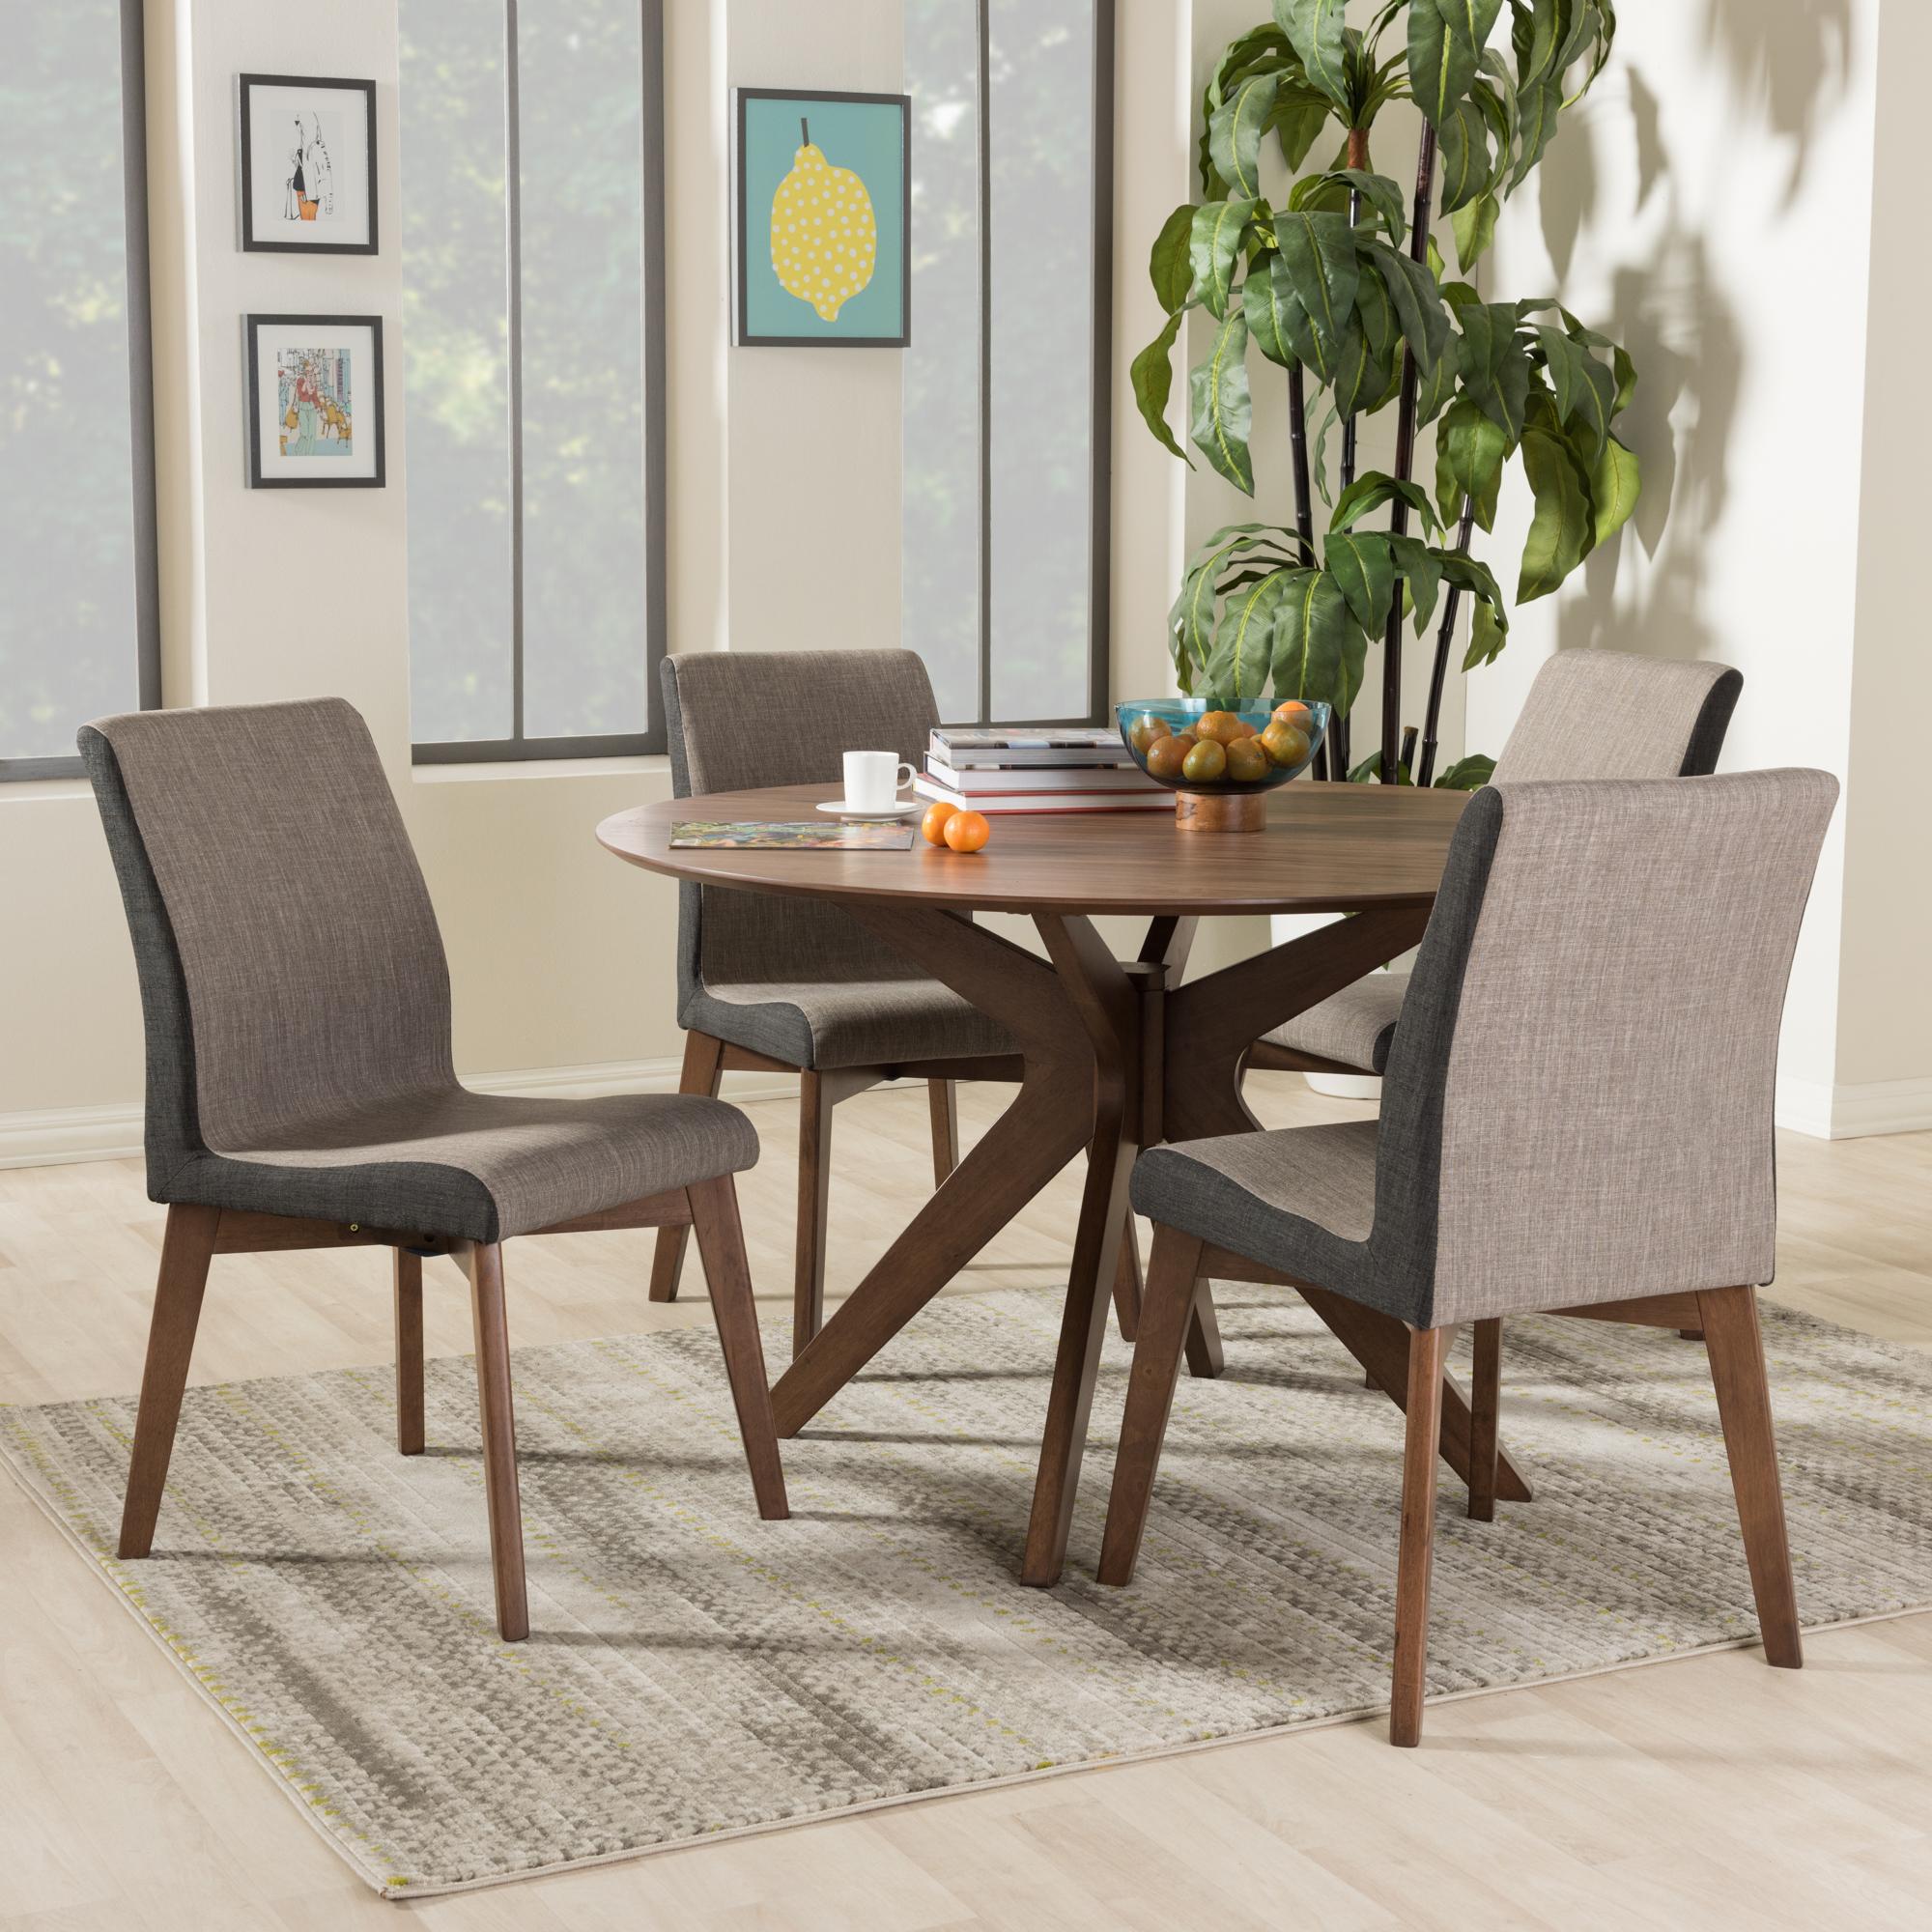 ... Baxton Studio Kimberly Mid Century Modern Walnut Wood Round 5 Piece  Dining Set